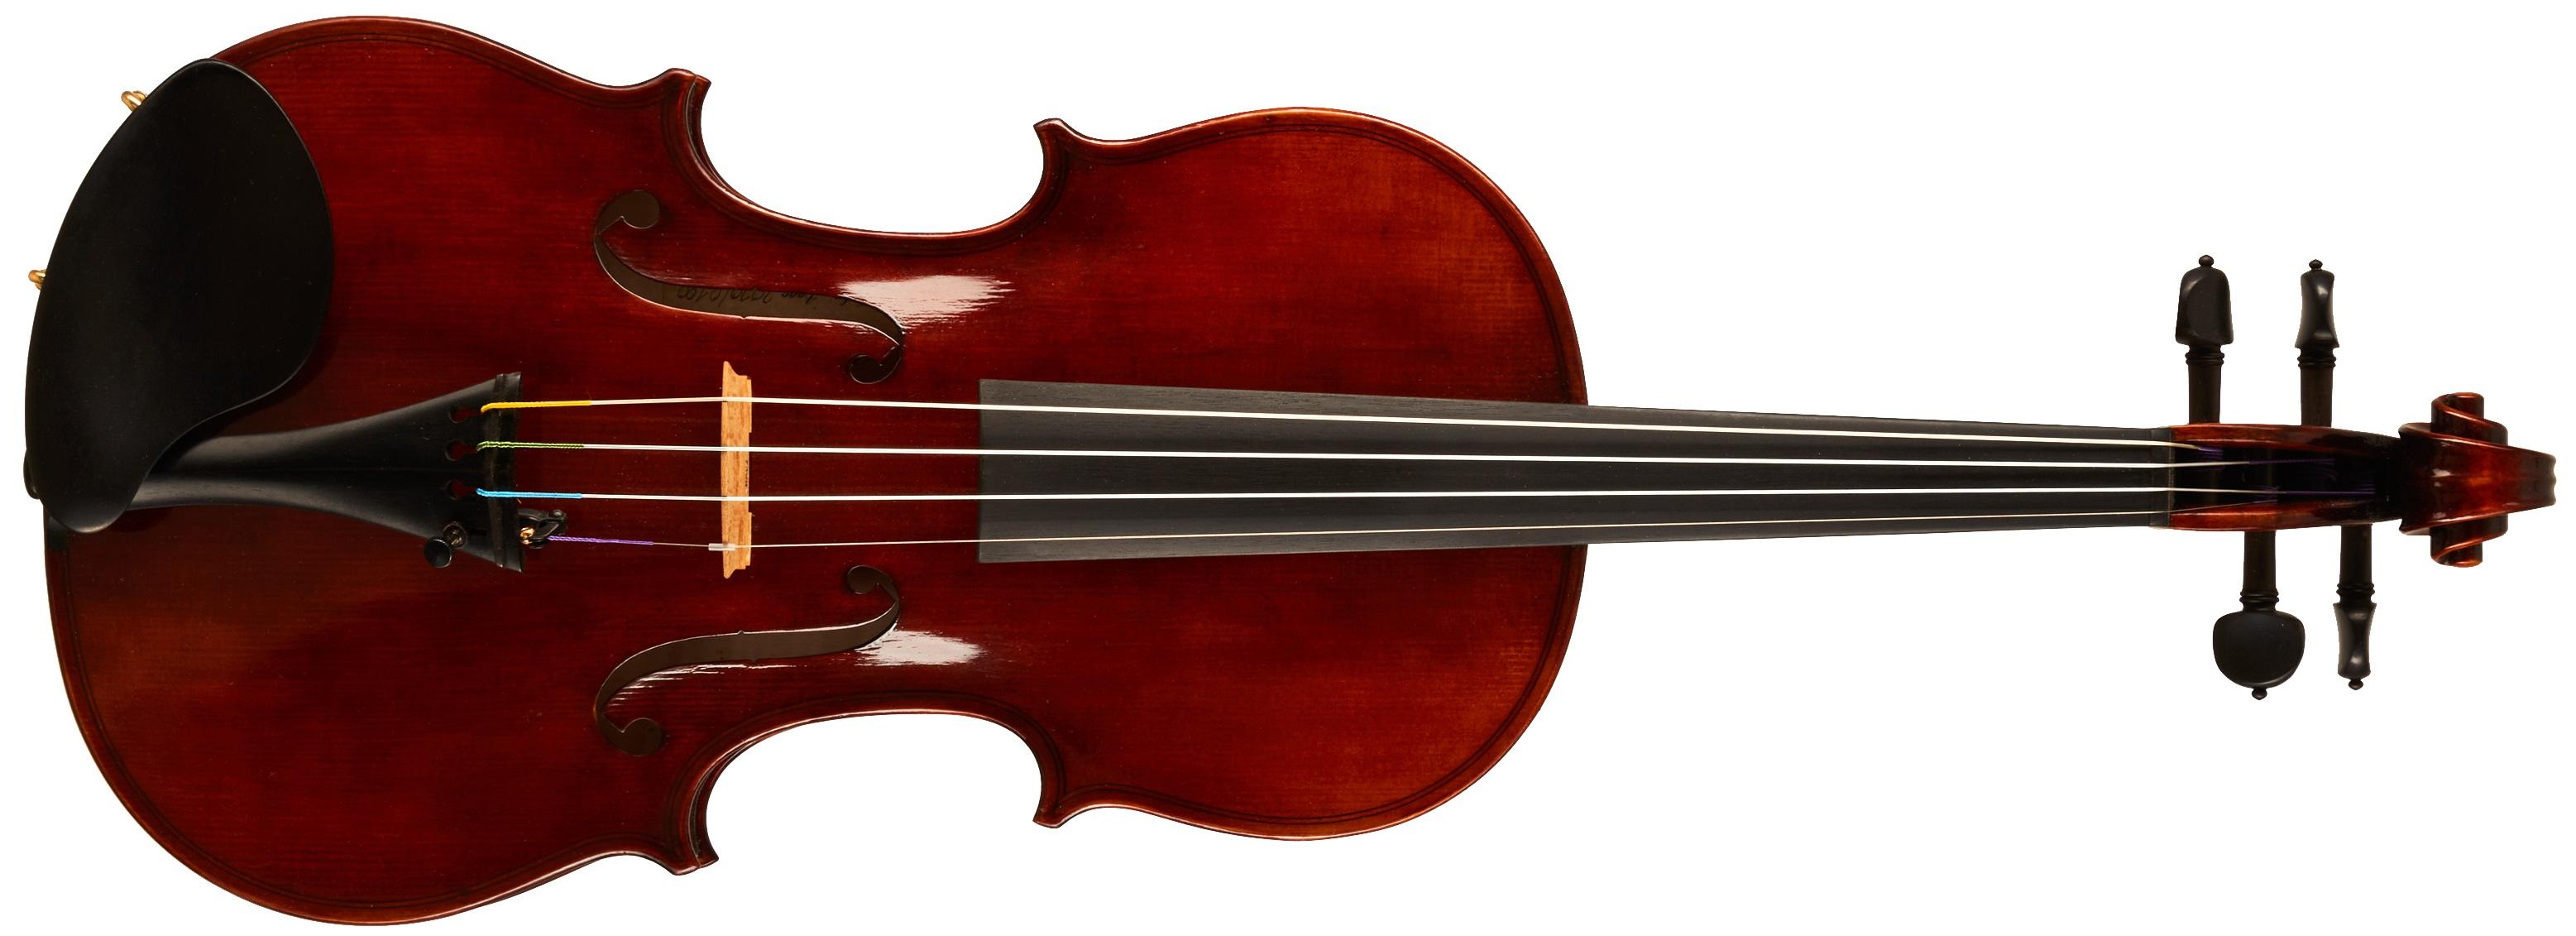 Maestro Instrument Petr Rácz Concerto Stradivari